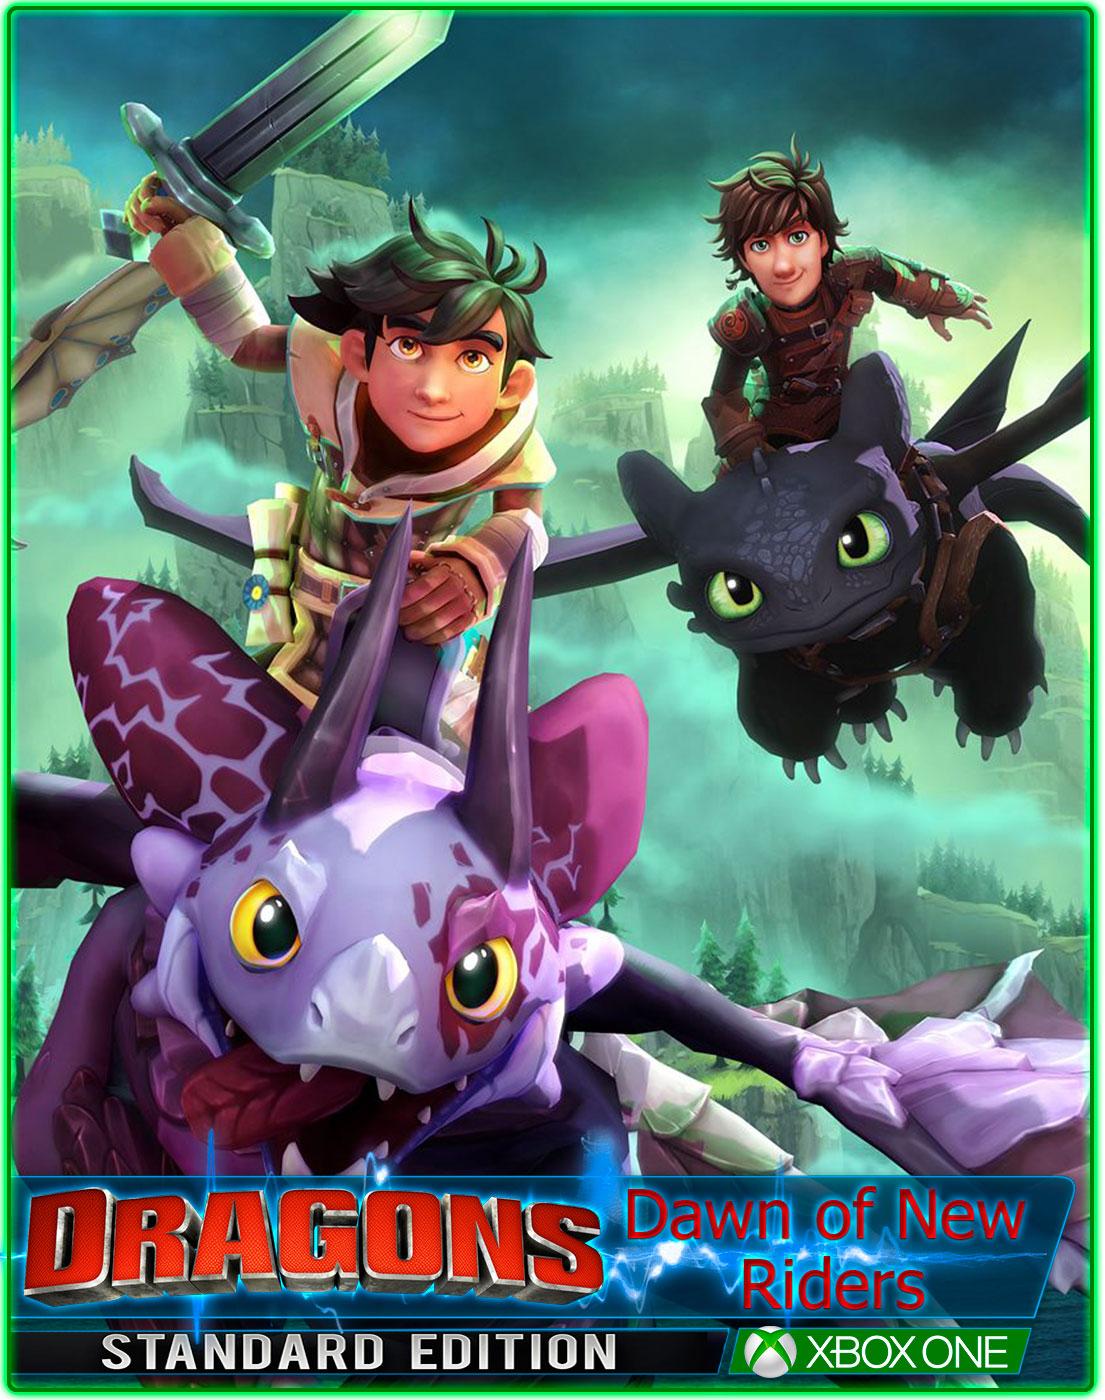 DreamWorks Dragons Dawn of New Riders(XBOX ONE) 2019